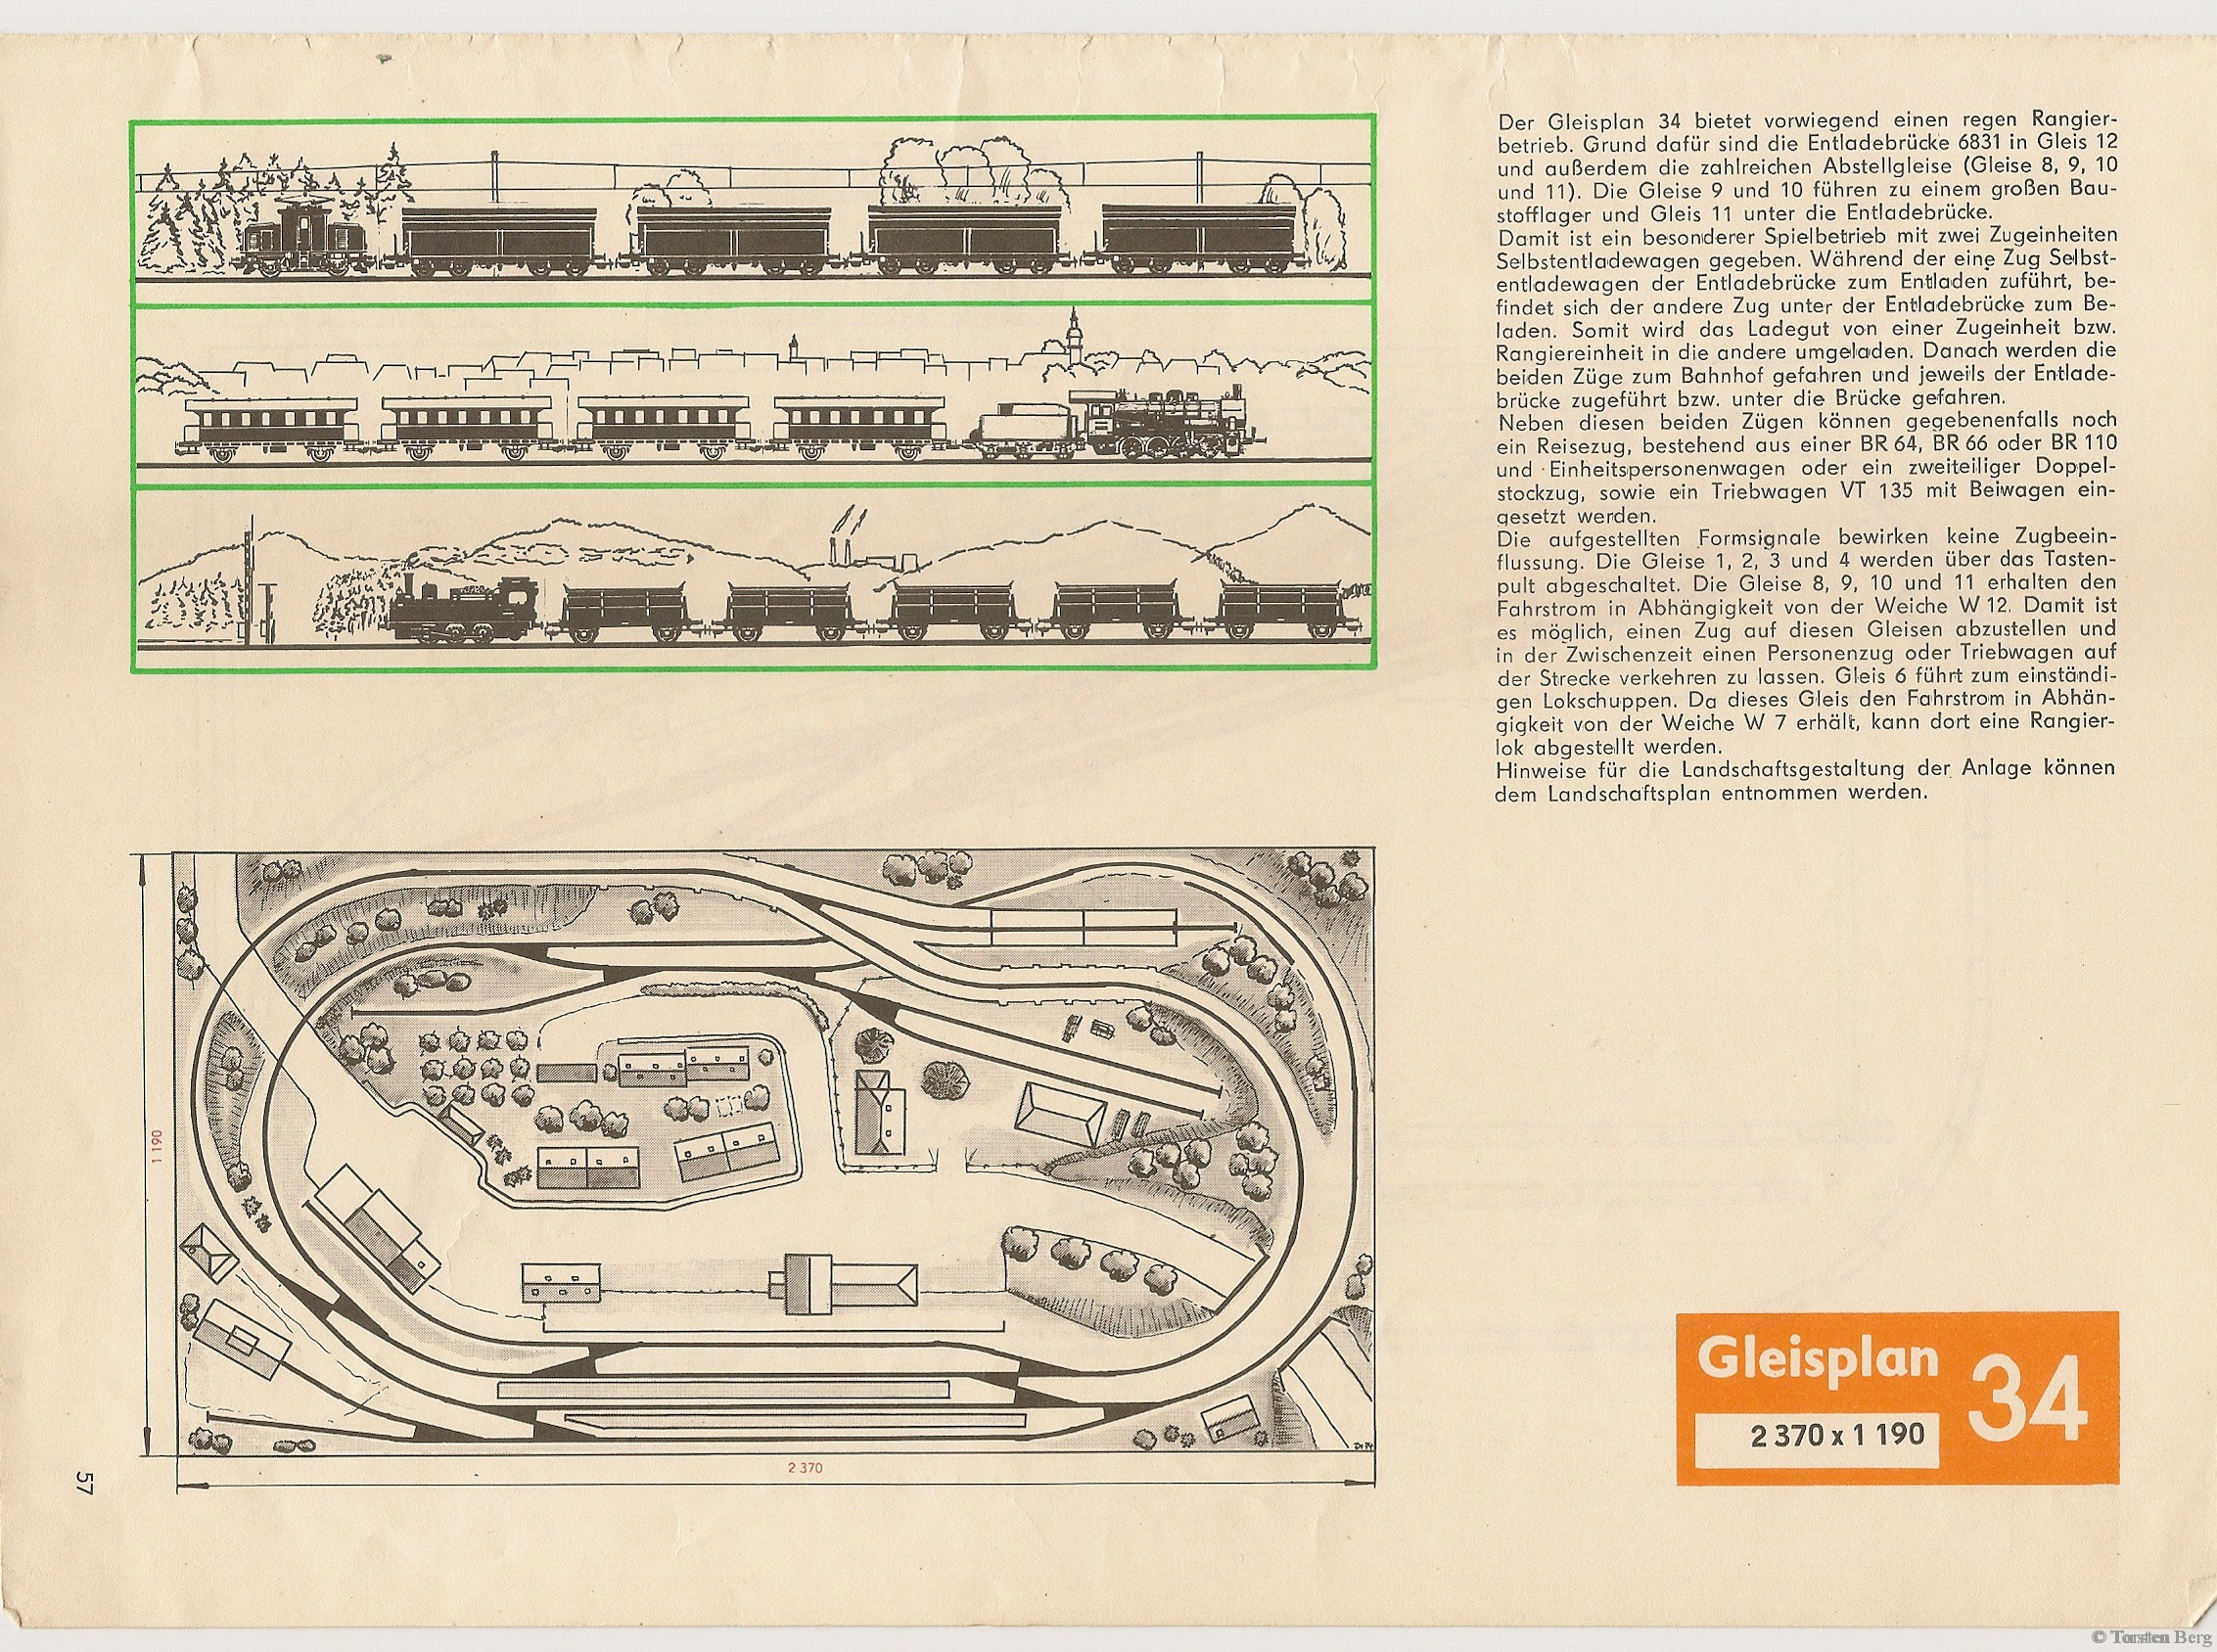 58 VEB Kombinat PIKO Standardgleis-Gleisplan 34